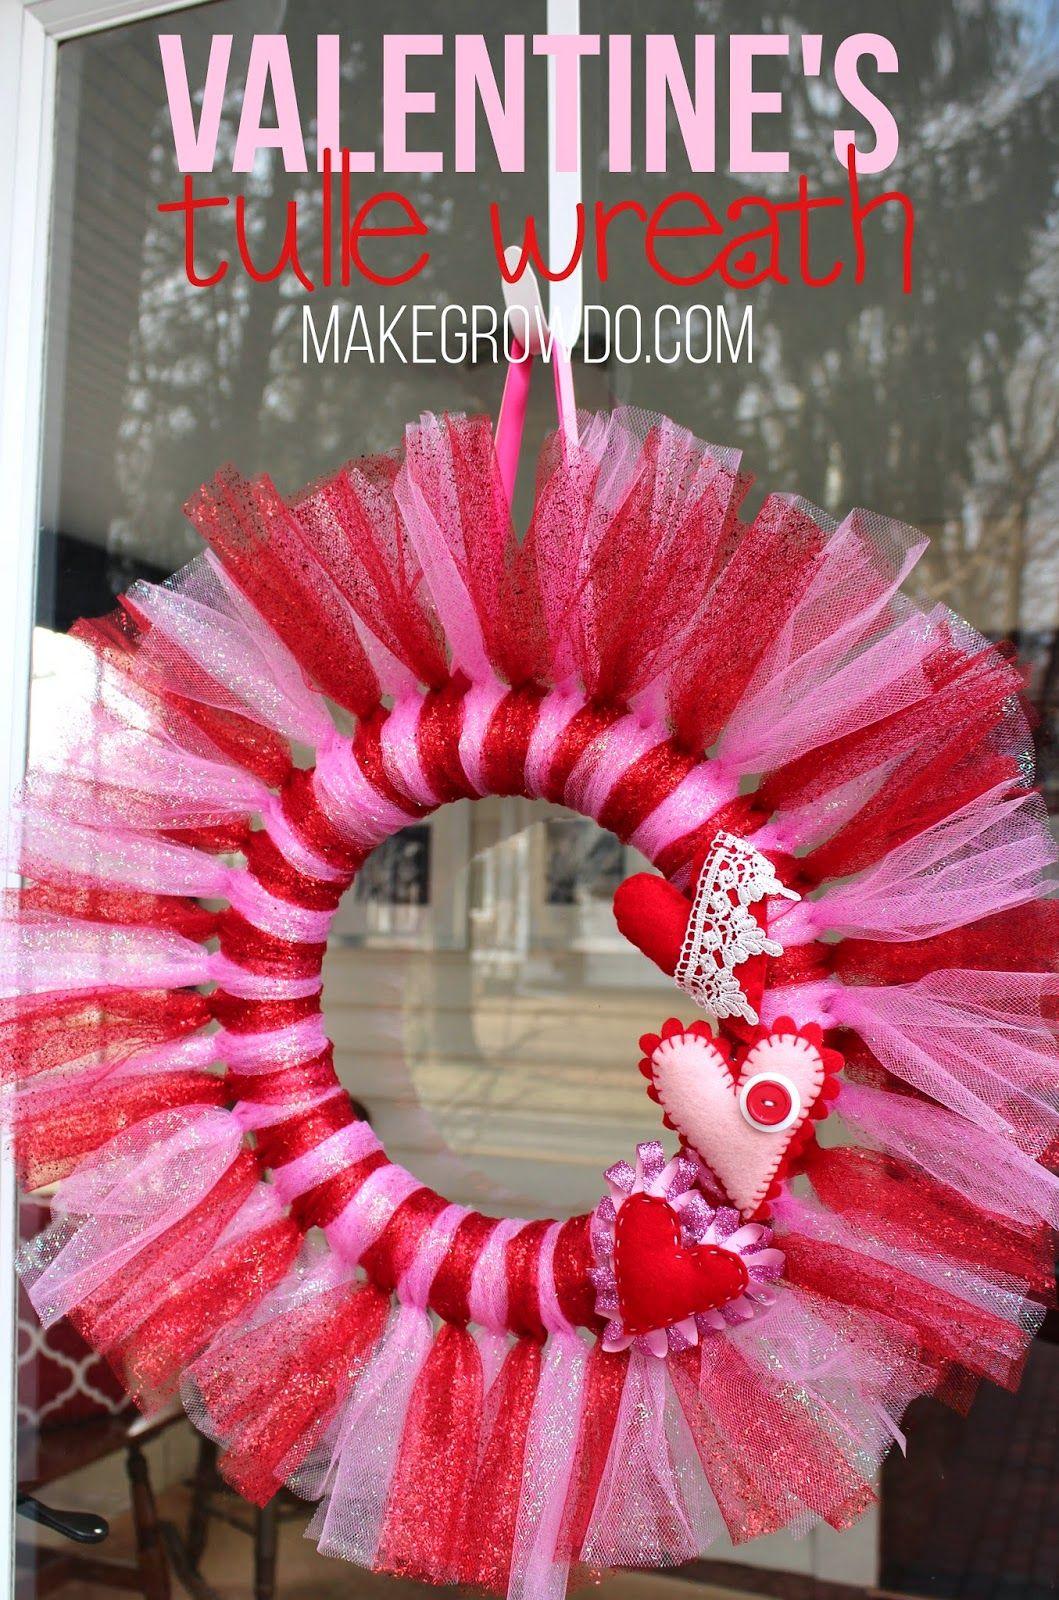 Diy valentines tulle wreath an easy inexpensive way to dress up diy valentines tulle wreath an easy inexpensive way to dress up your door rubansaba